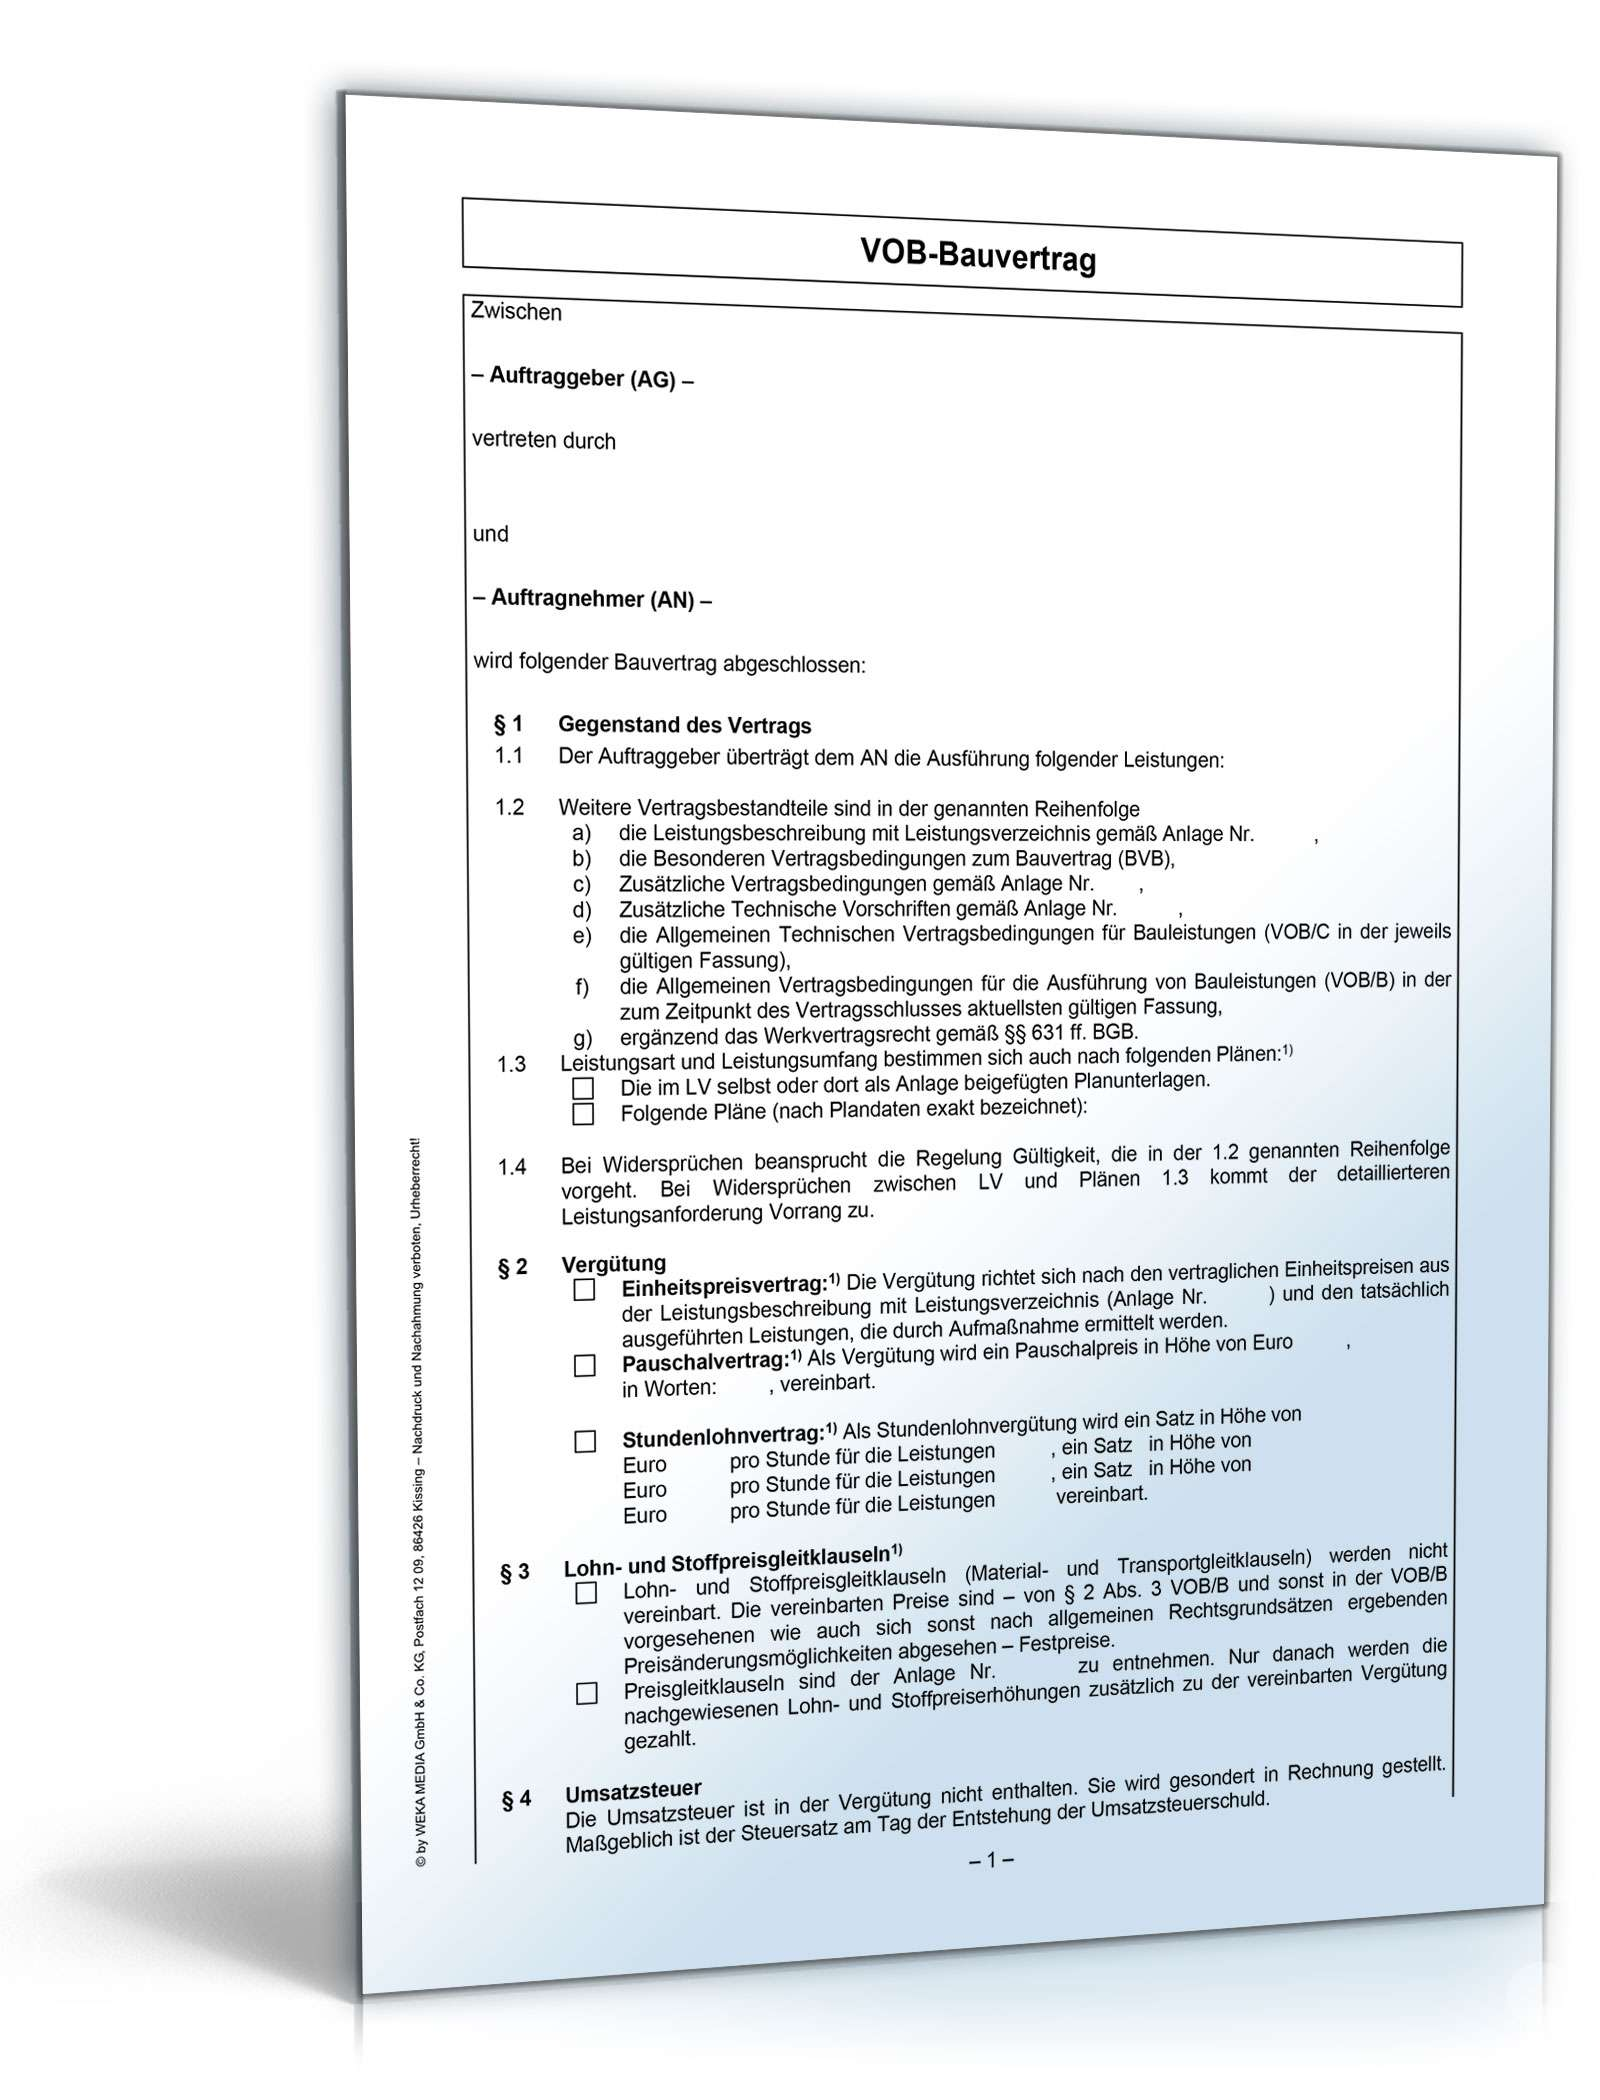 Enchanting Bauvertrag Proben Illustration - FORTSETZUNG ARBEITSBLATT ...